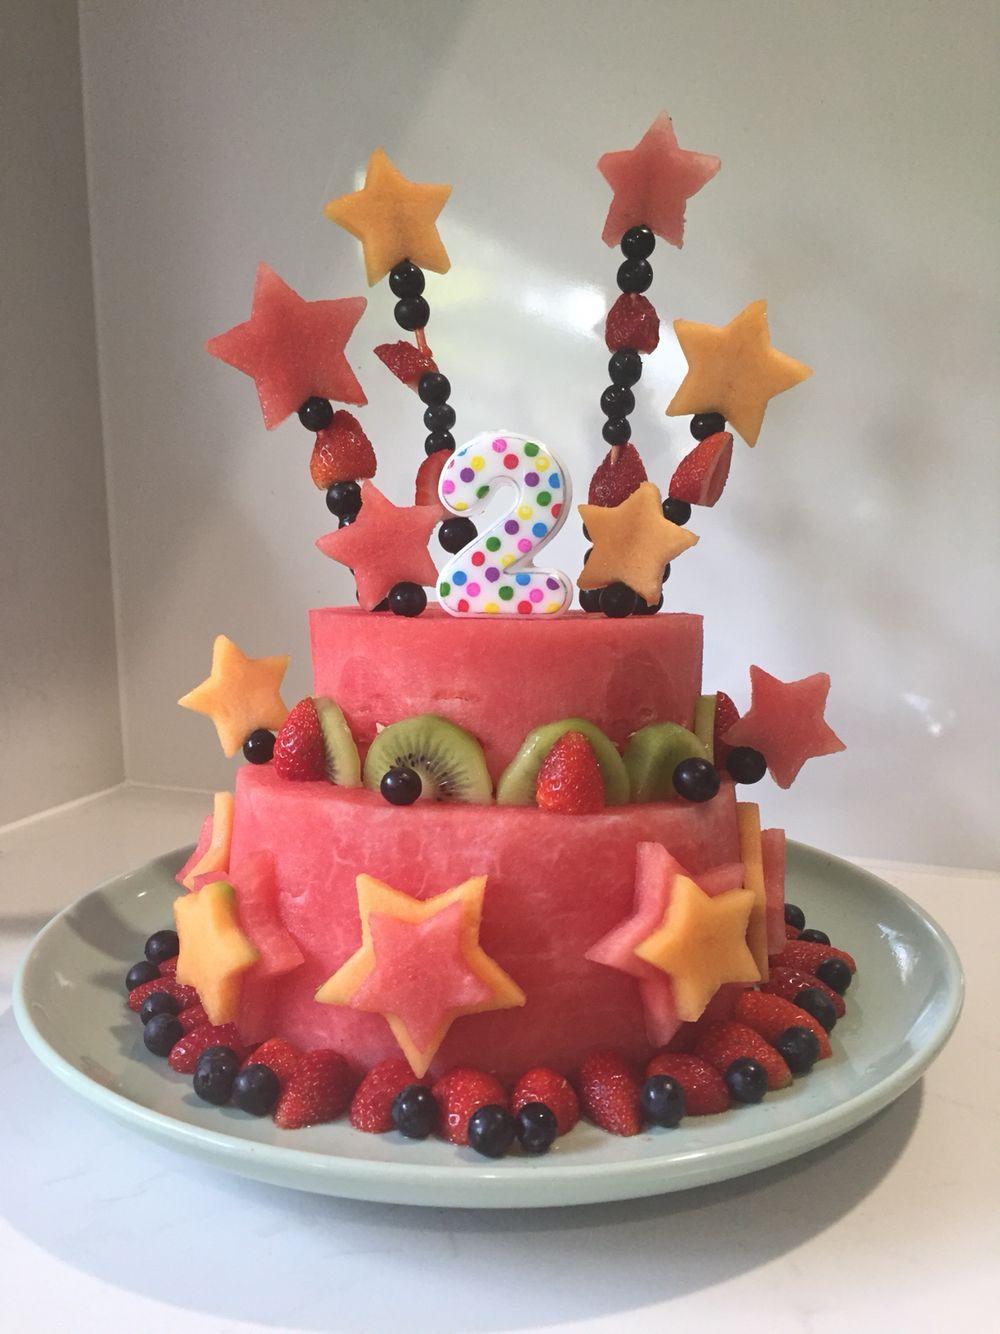 Watermelon fruit cake kids birthday cake. I made this